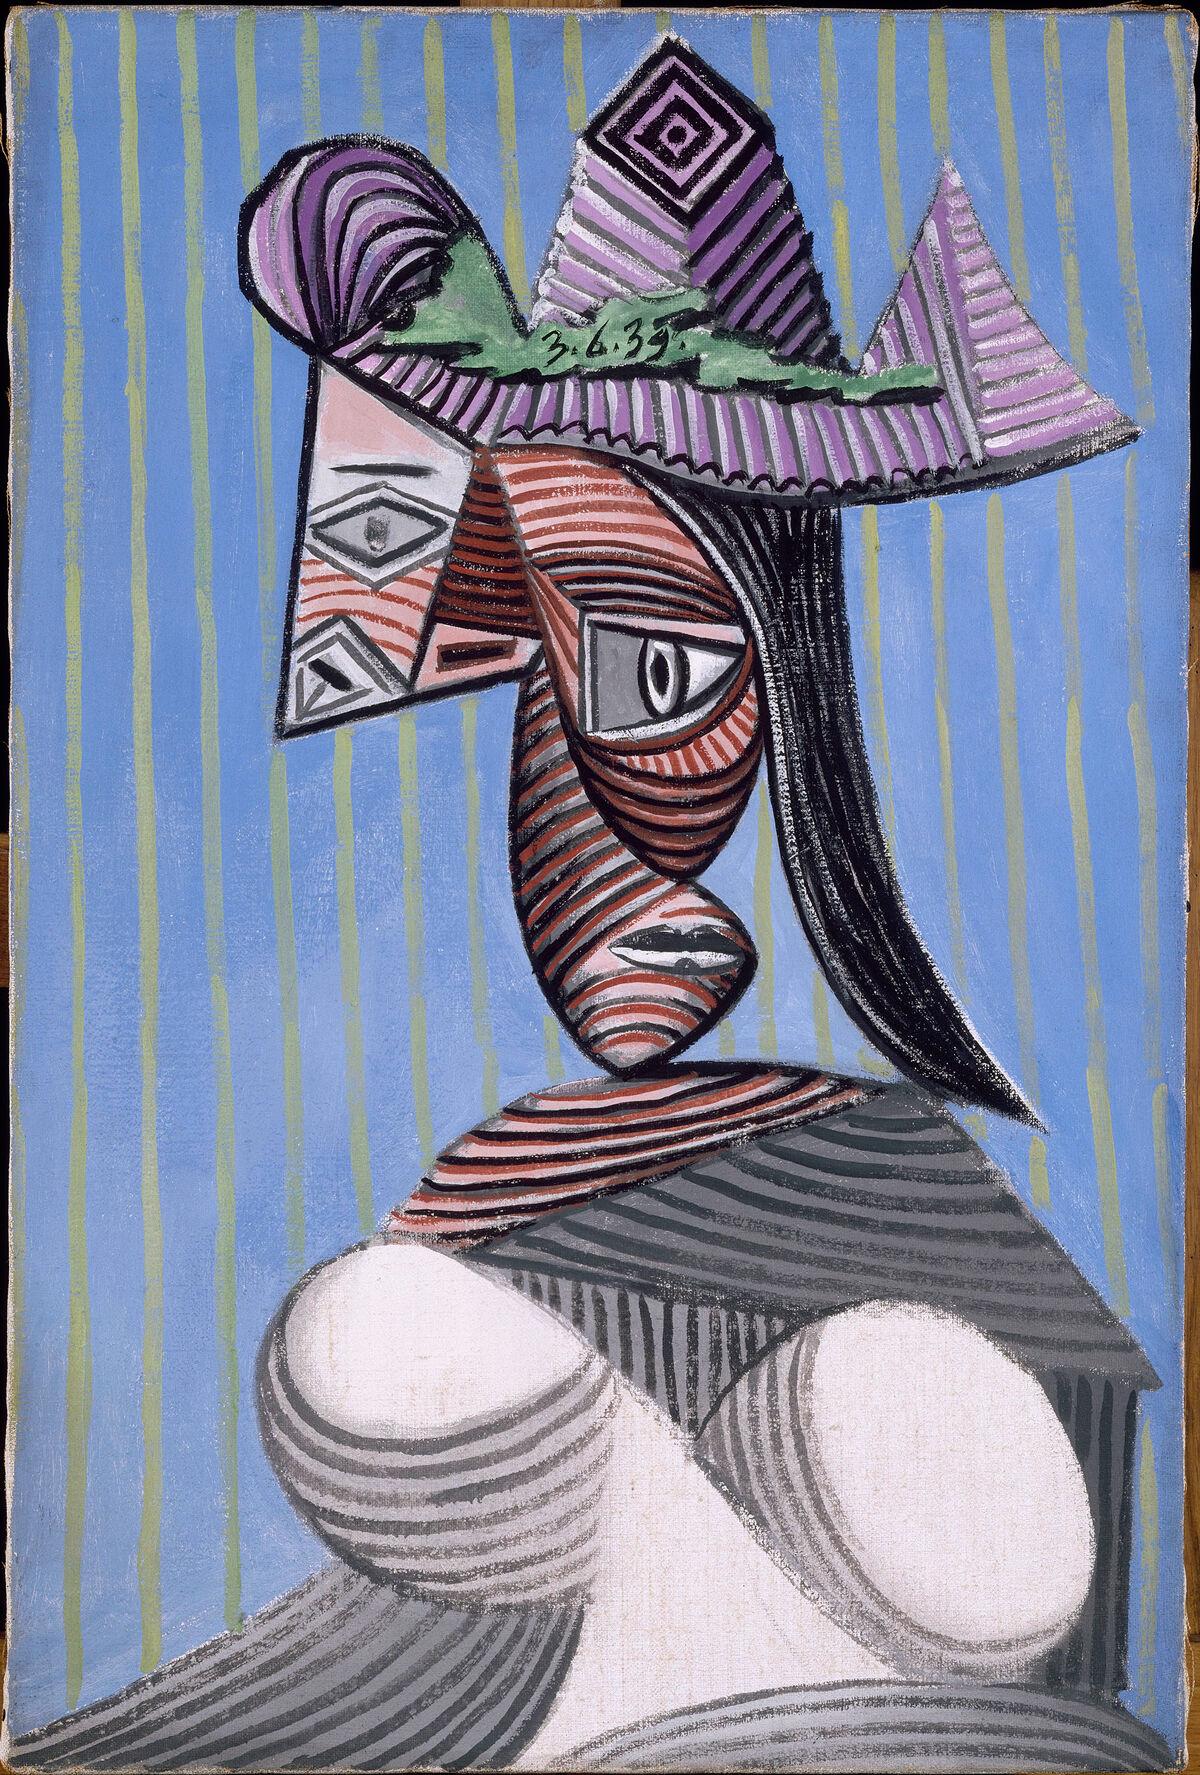 Picasso, Busto de mujer con sombrero de rayas, 1939. Musée Picasso Paris. © Sucesión Picasso. VEGAP, 2017. Courtesy of Museo Nacional Centro de Arte Reina Sofía.